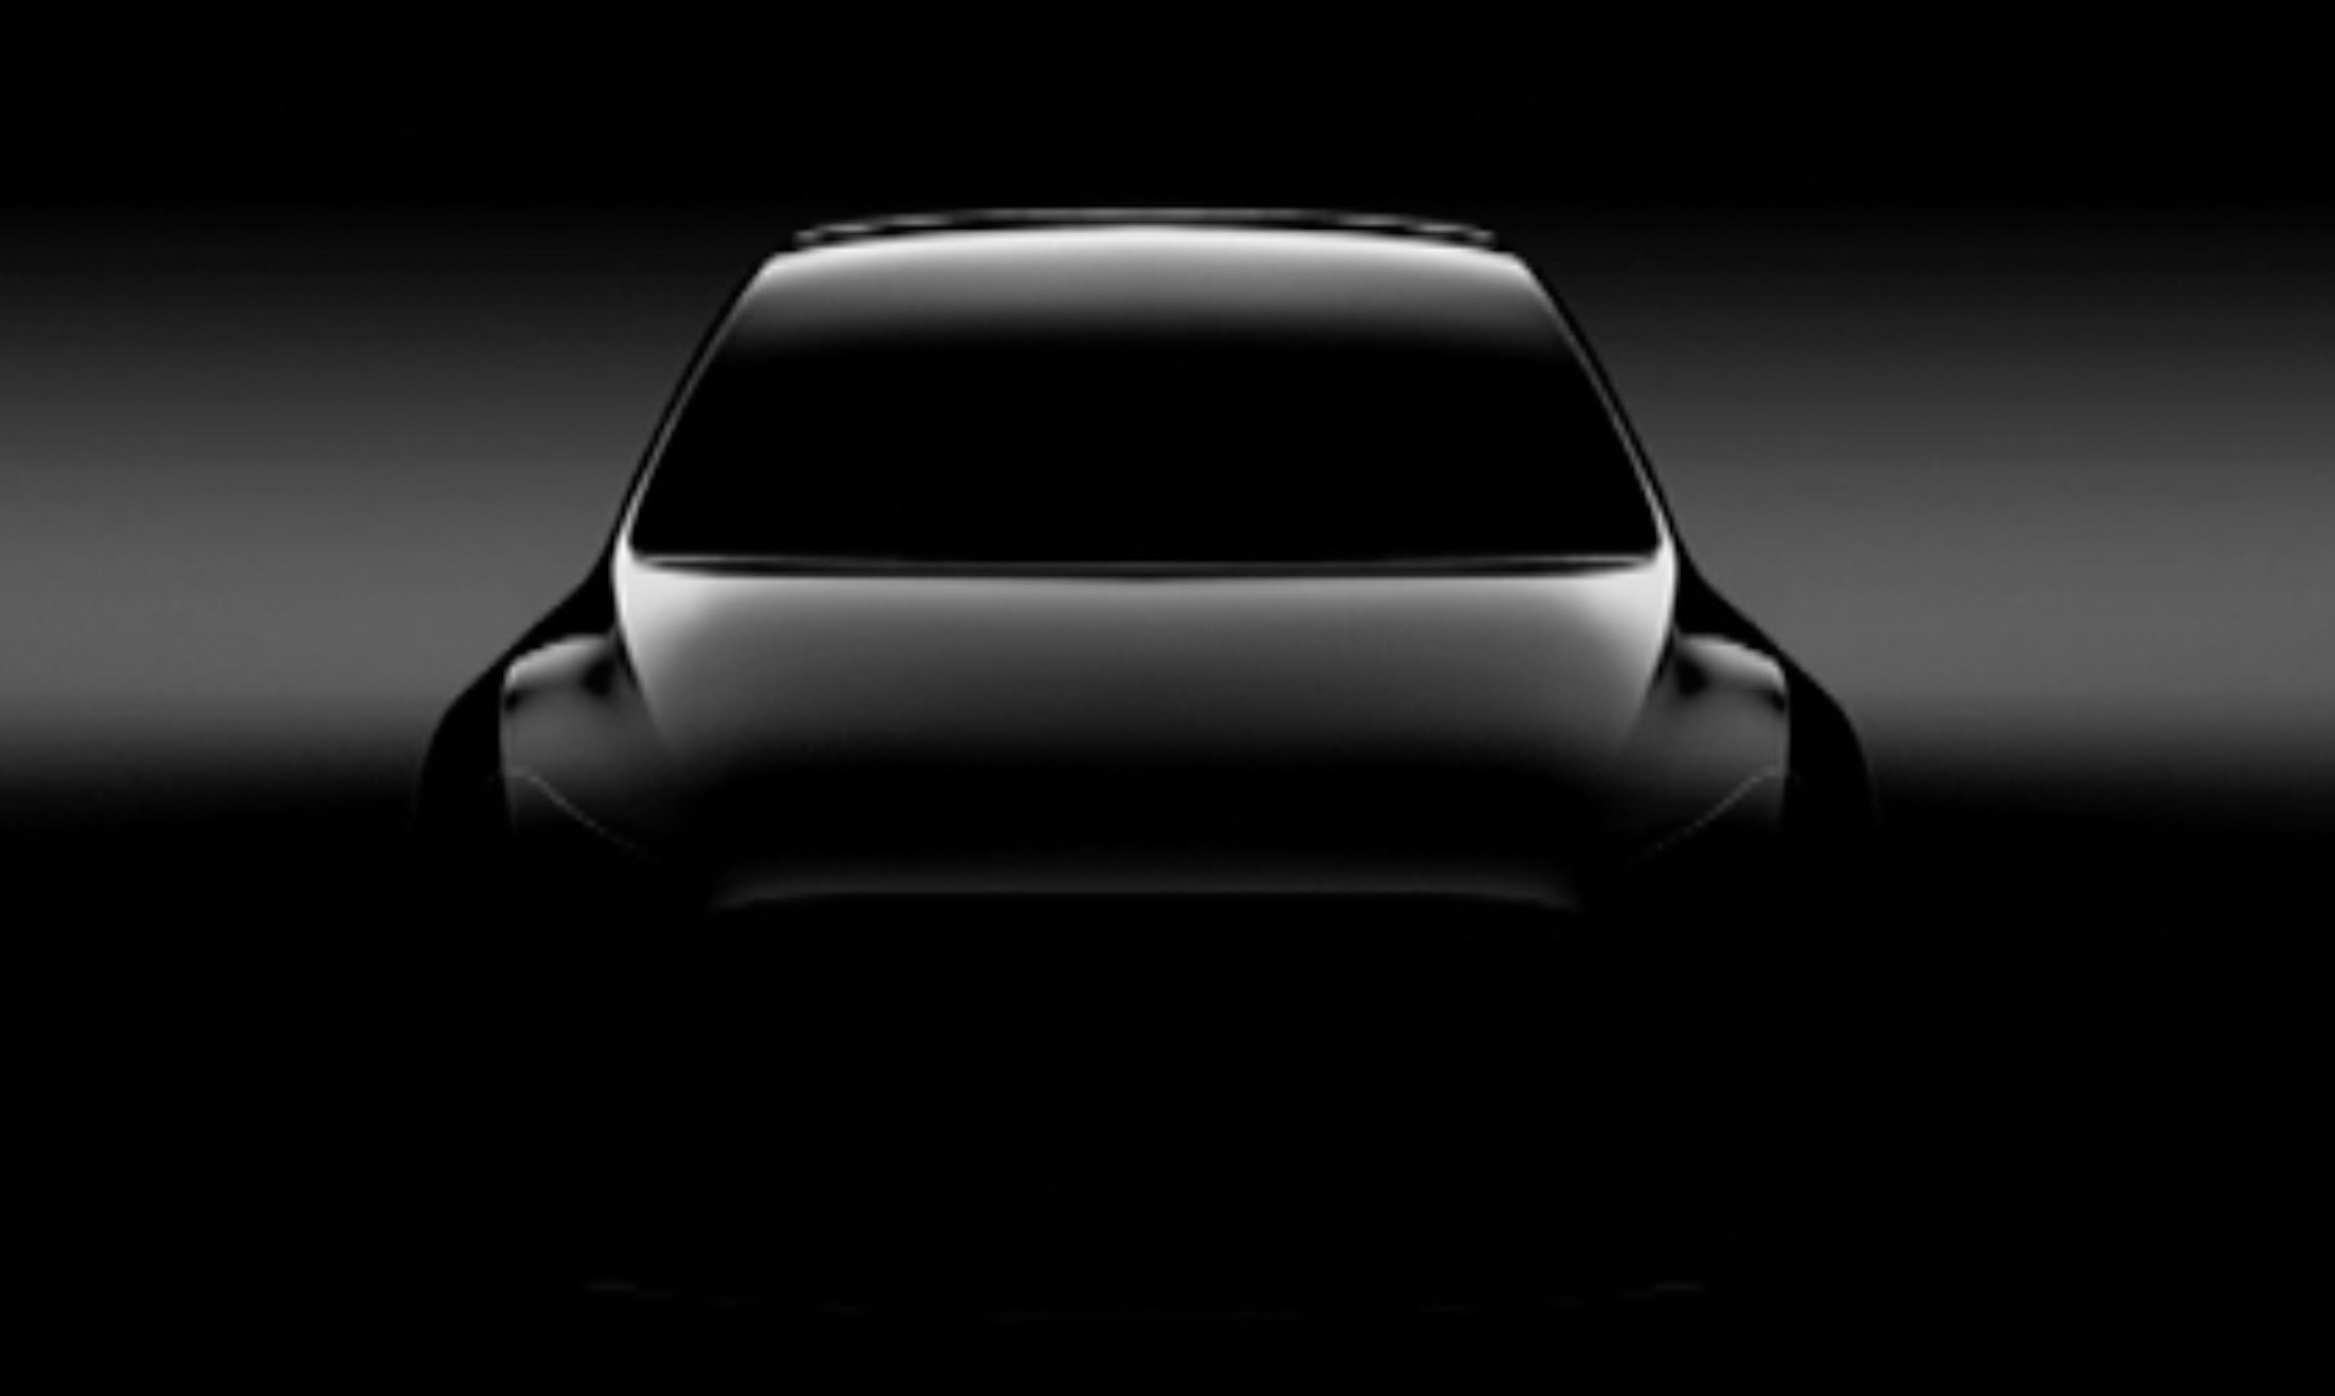 69 All New Tesla Horizon 2020 Reviews with Tesla Horizon 2020